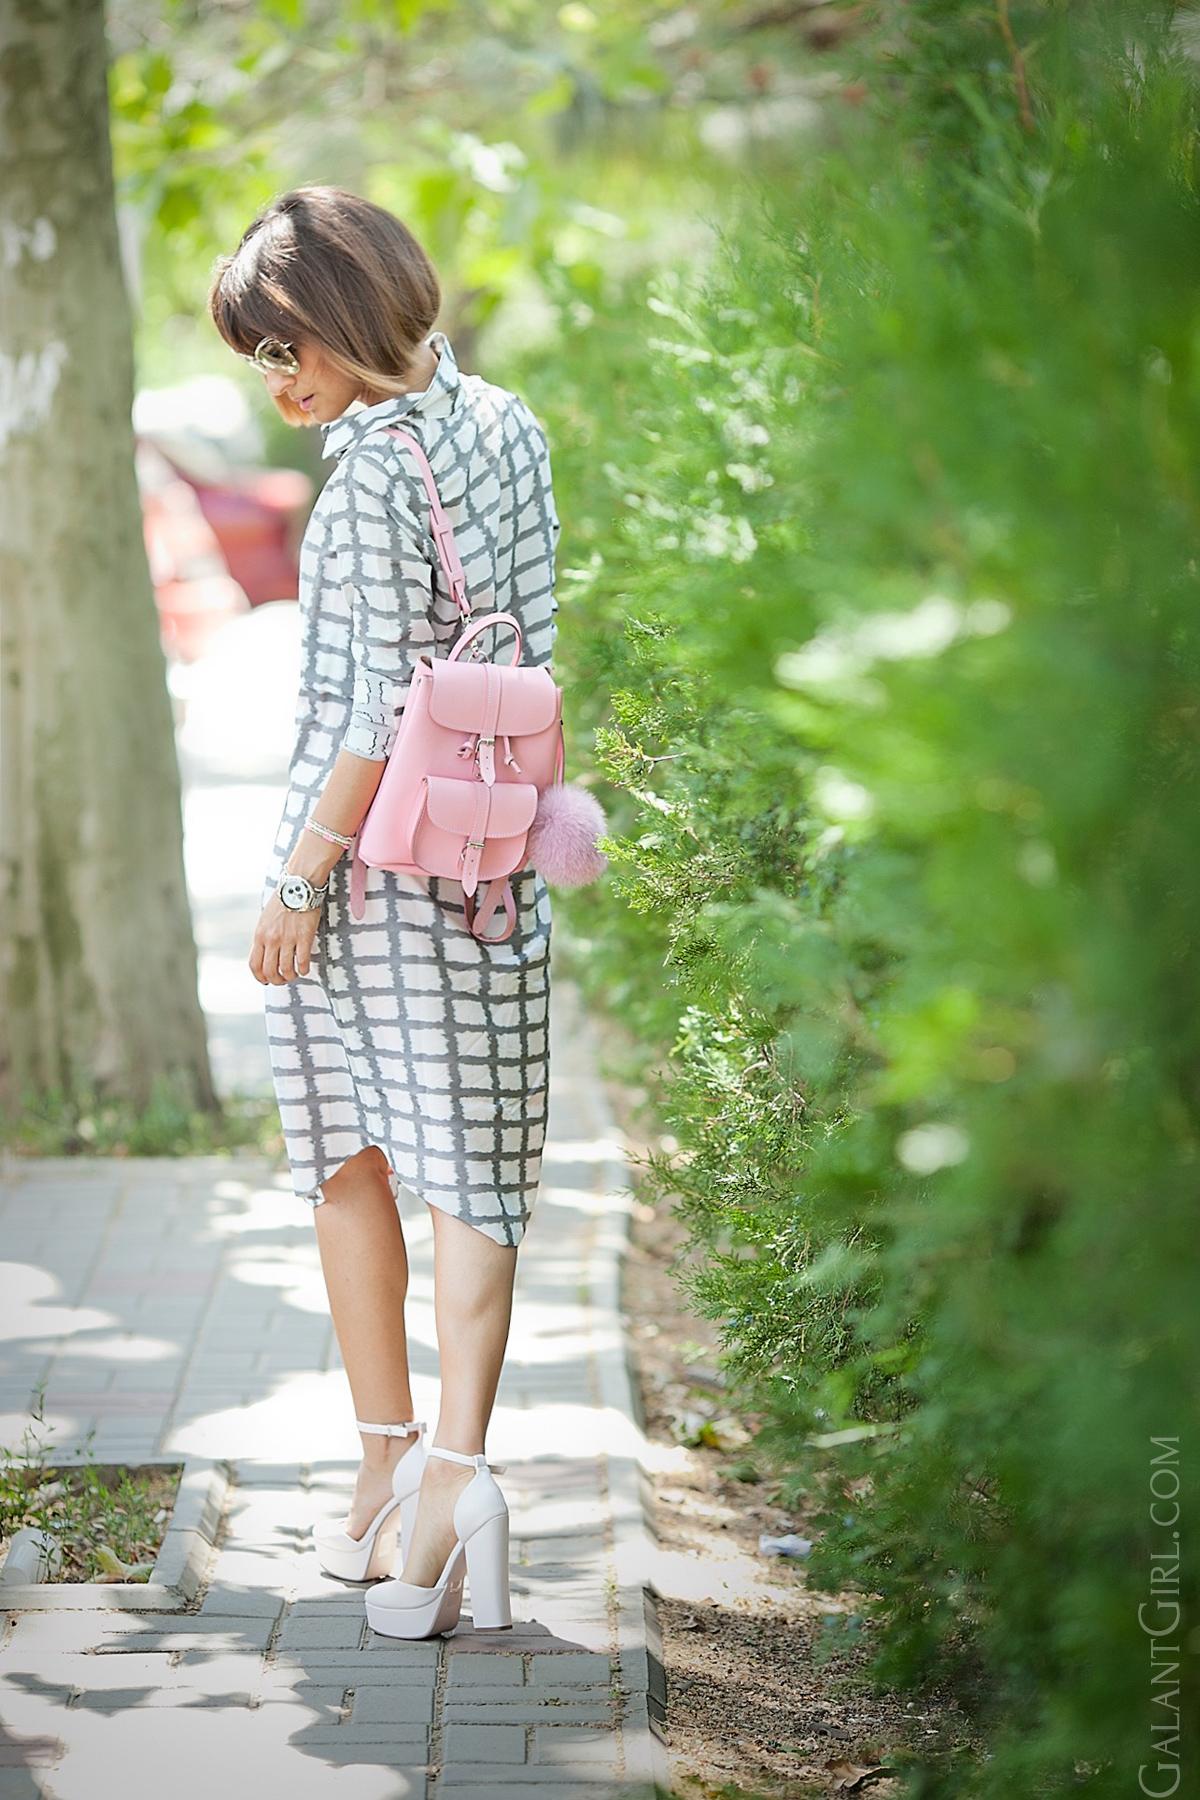 street-style-fashion-shirt-dress-outfit-galant-girl